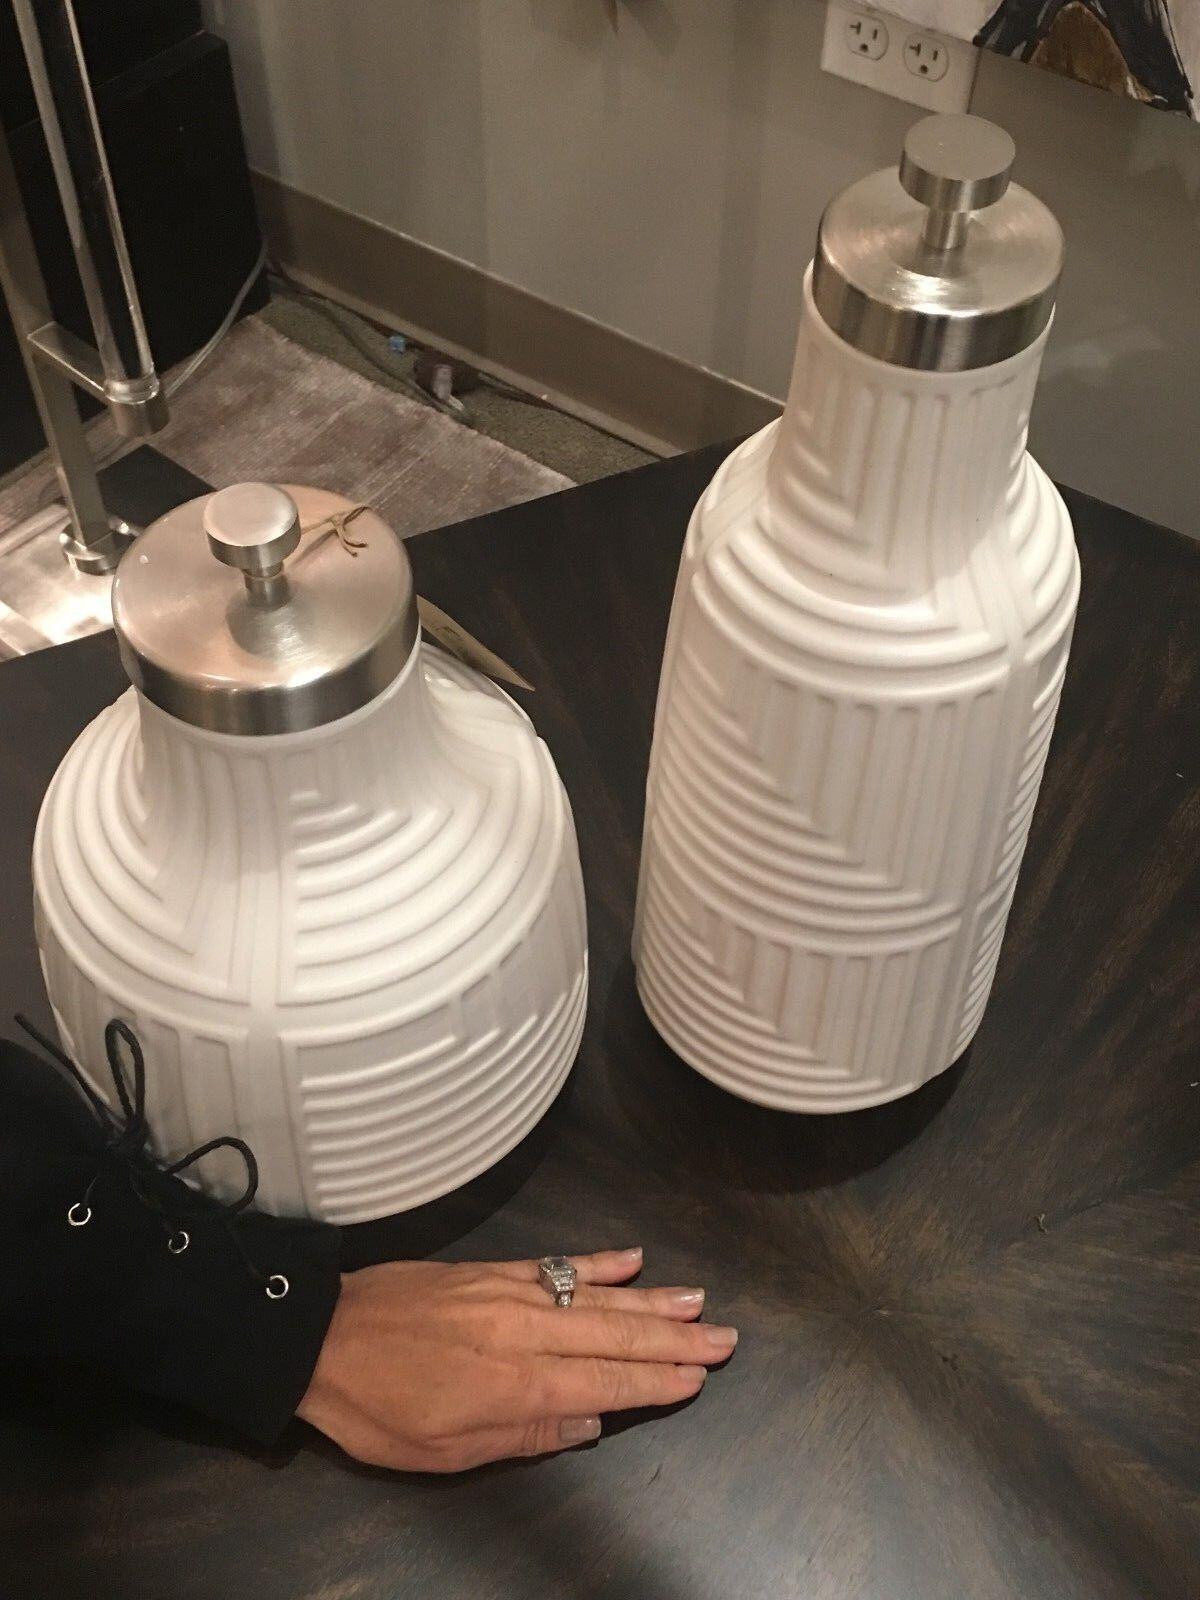 Cuatro urnas decorativo de cerámica blancoo mate texturado botellas Tapas de níquel cepillado